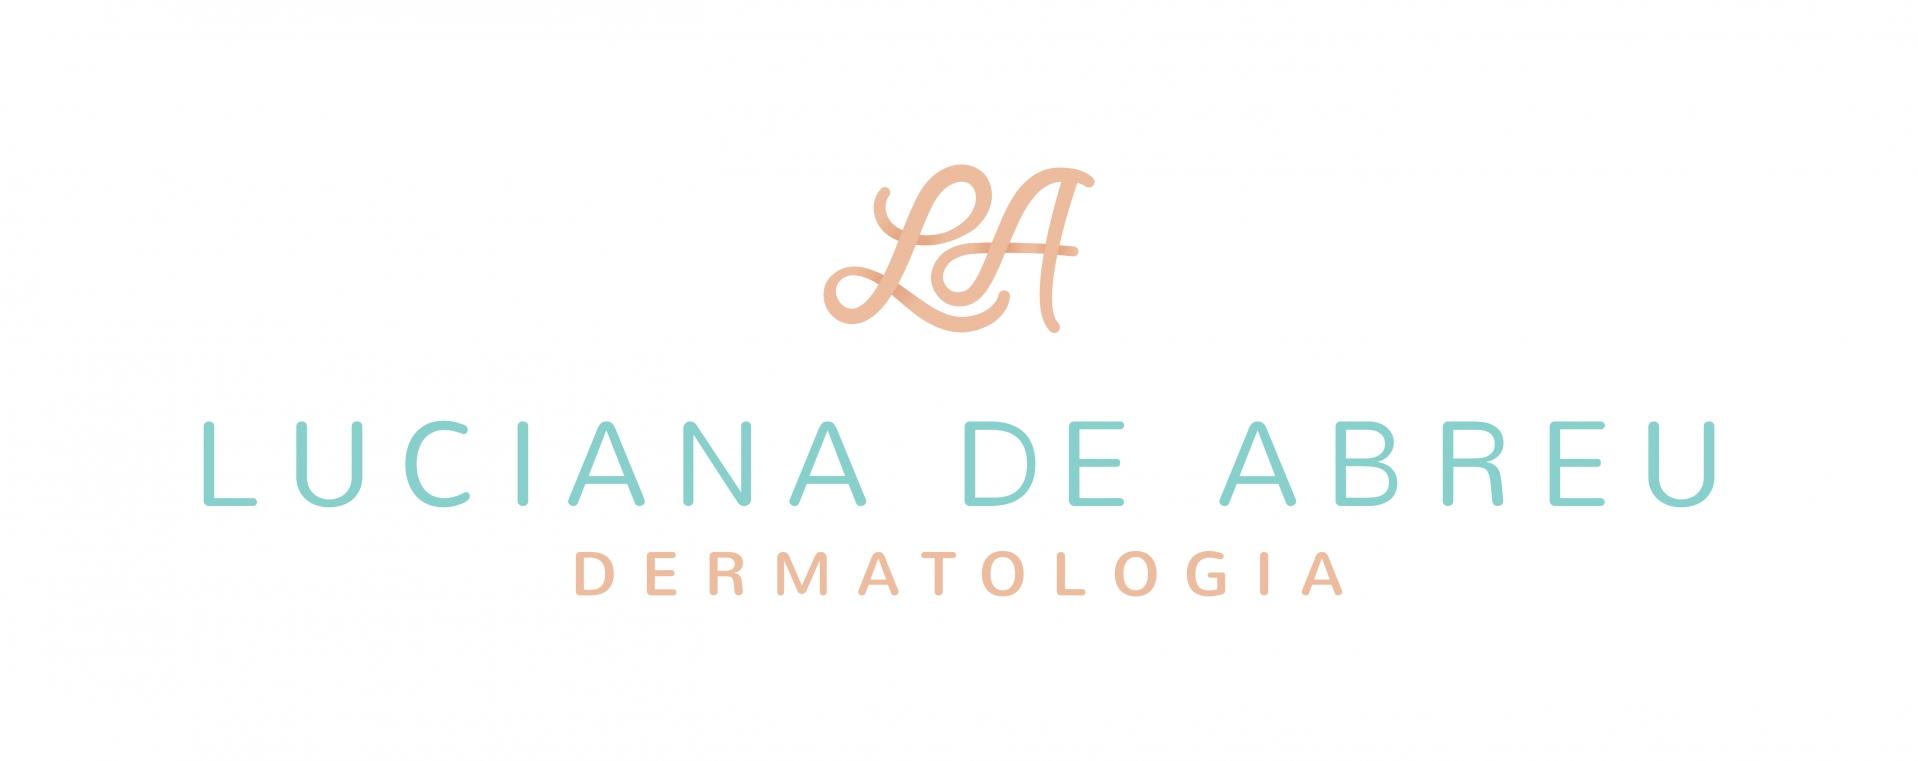 Logotipo - Luciana de Abreu